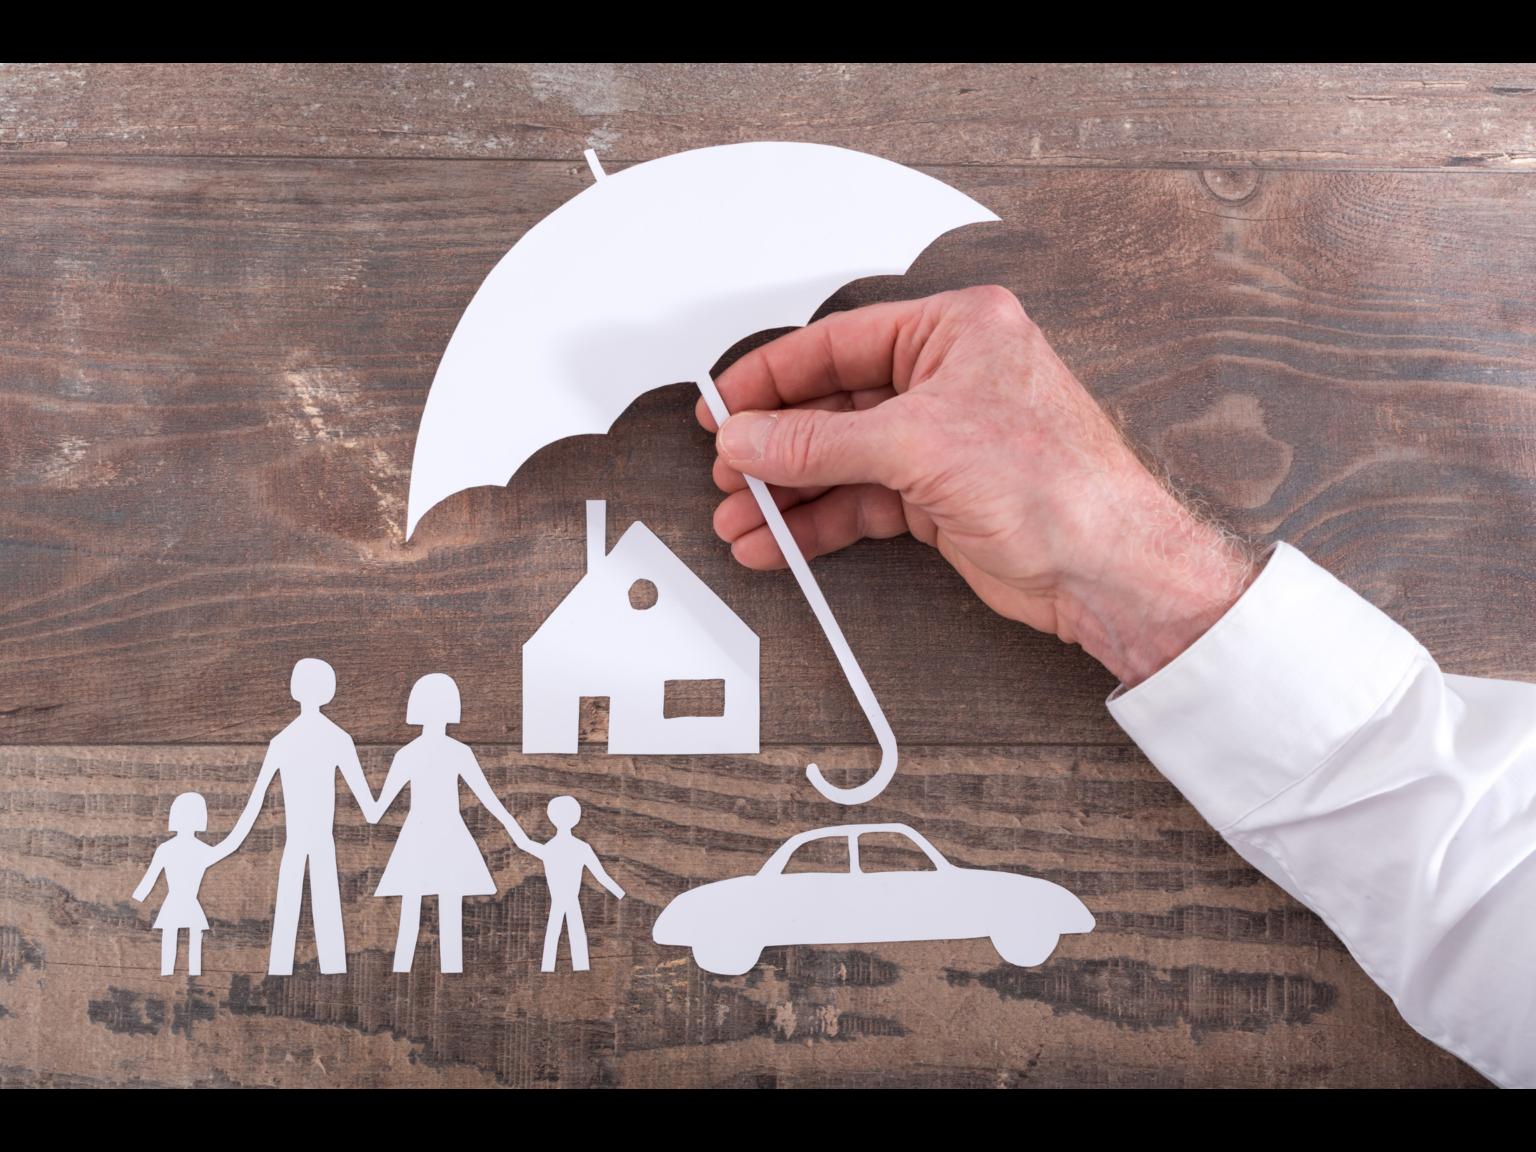 Family & Home under an umbrella image